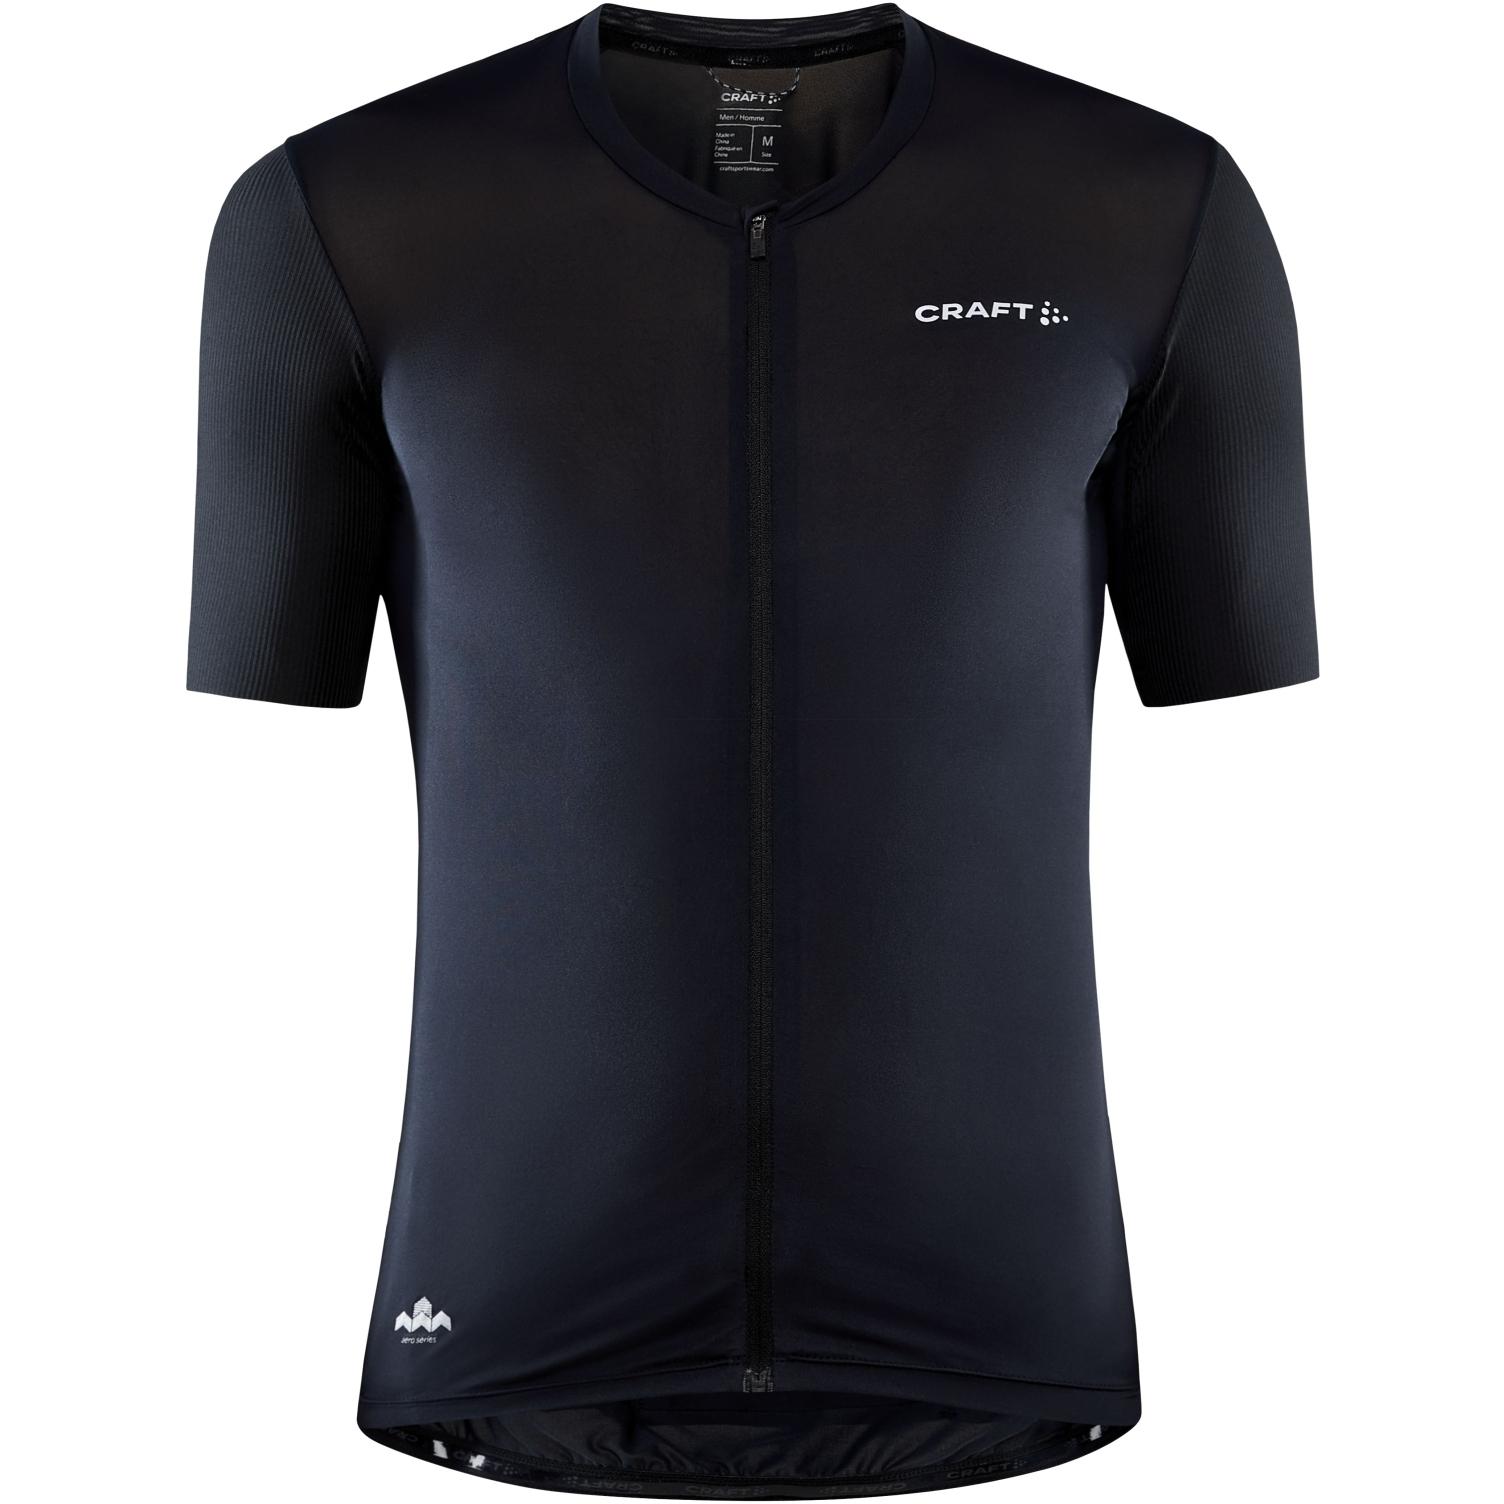 CRAFT ADV Aero Men's Jersey 1910535 - 999000 Black